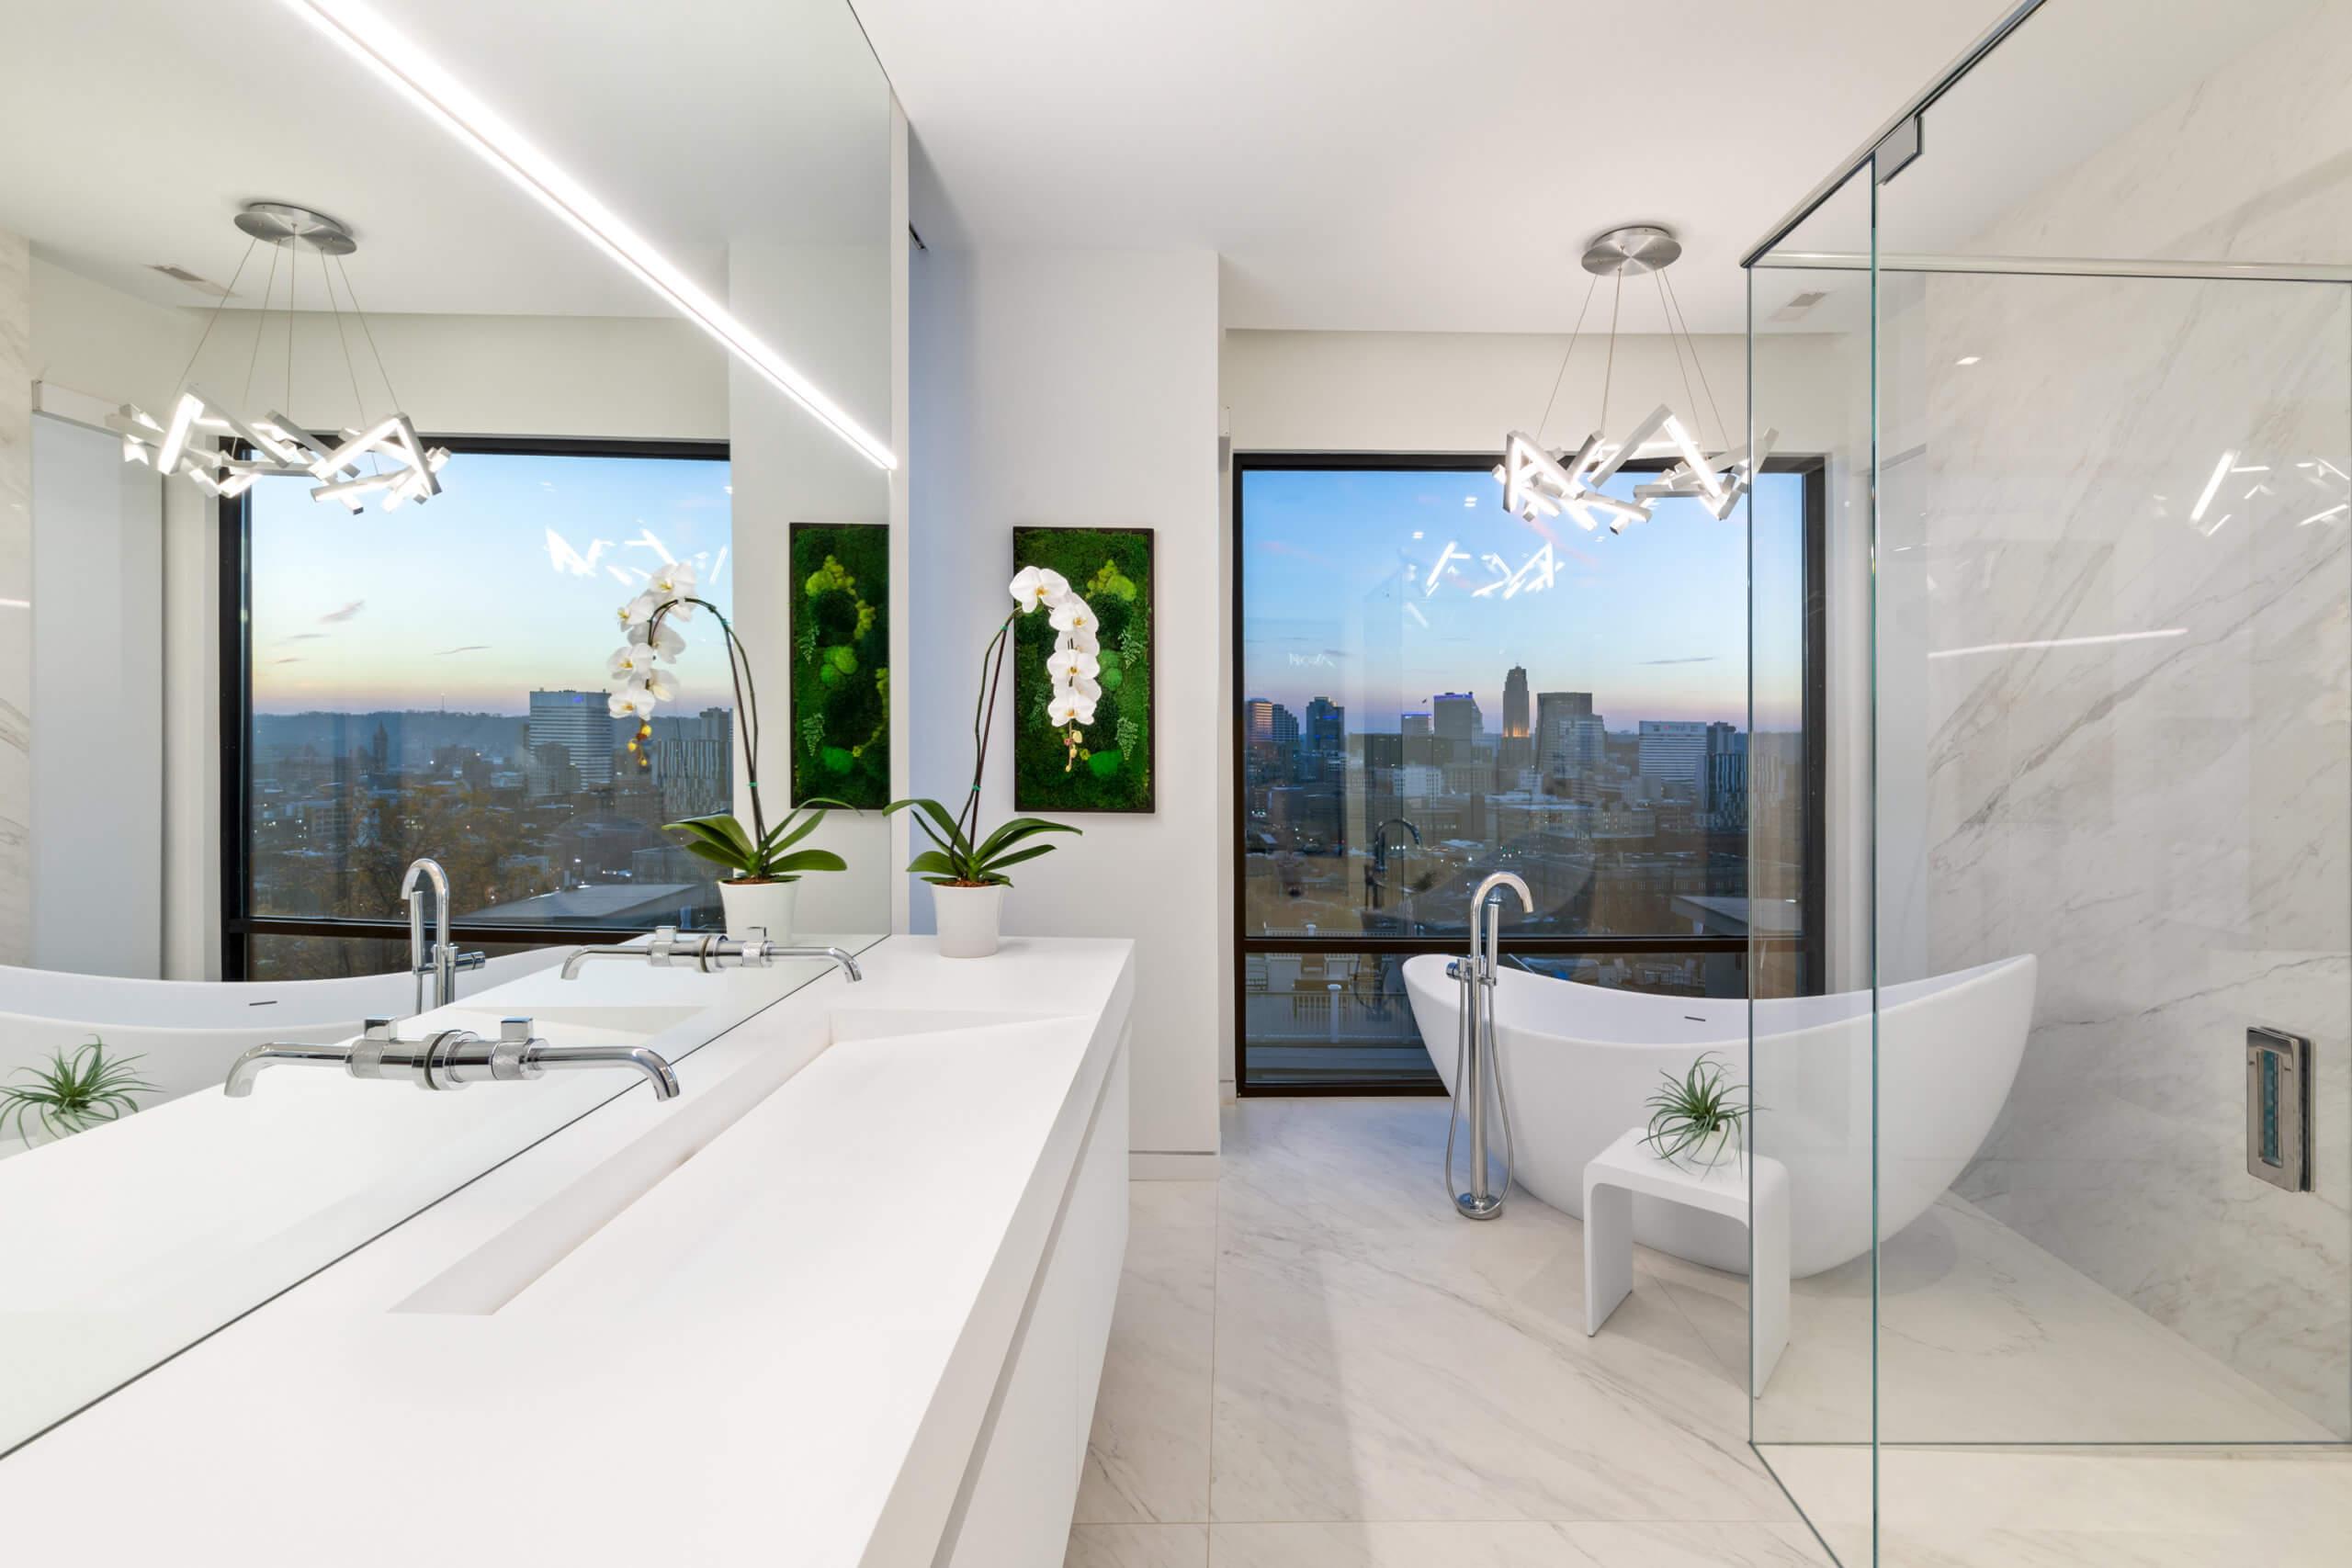 Modern Bathroom with Cincinnati Skyline View by Interior Designer RM Interiors